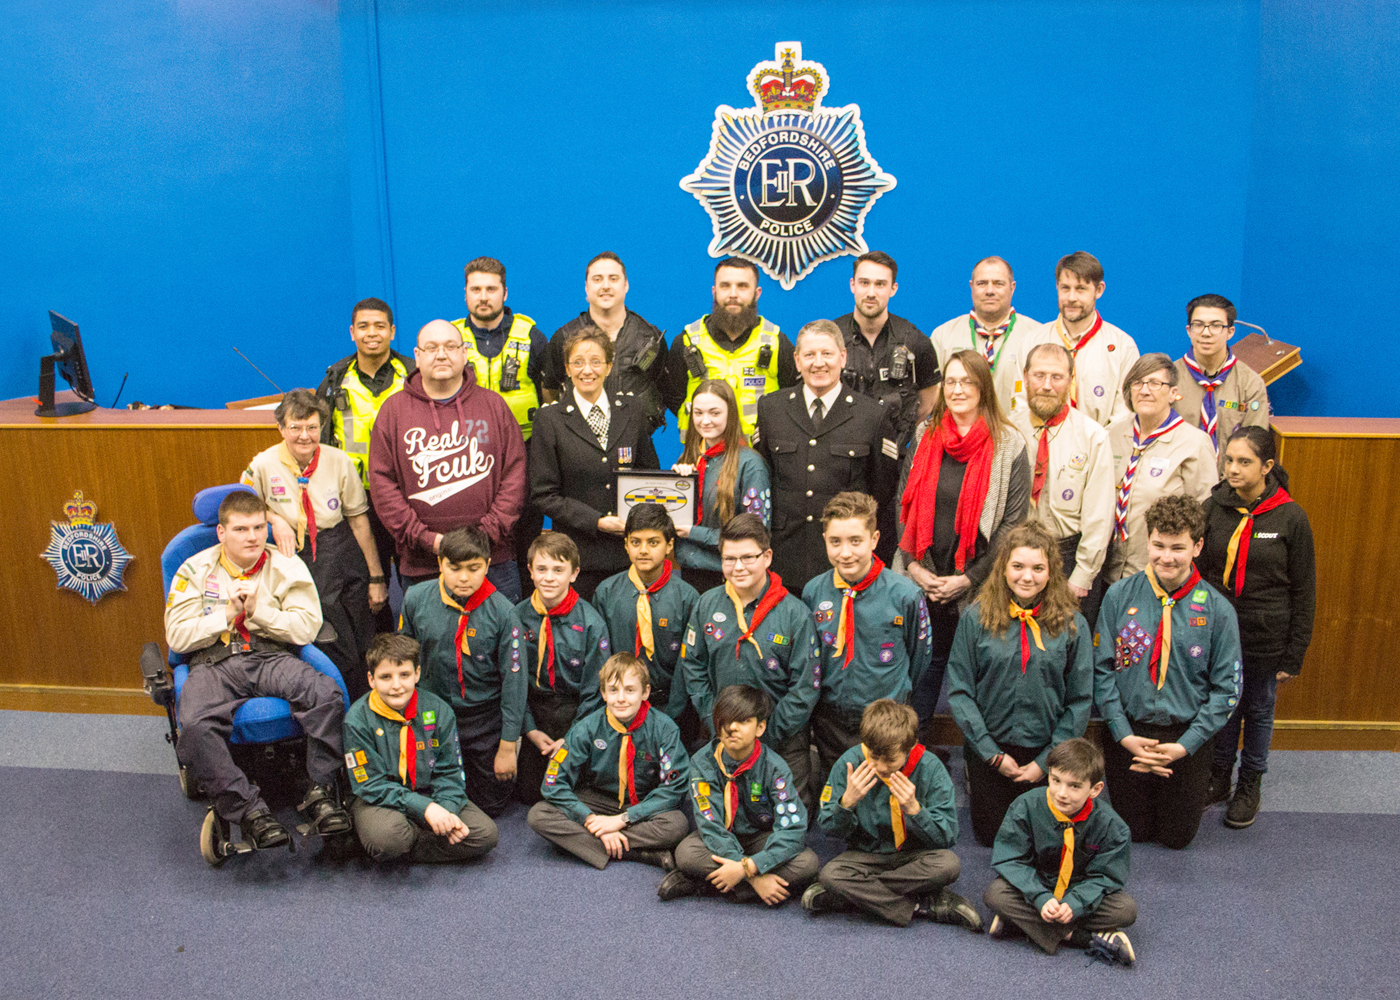 Bedfordshire Police Partnership